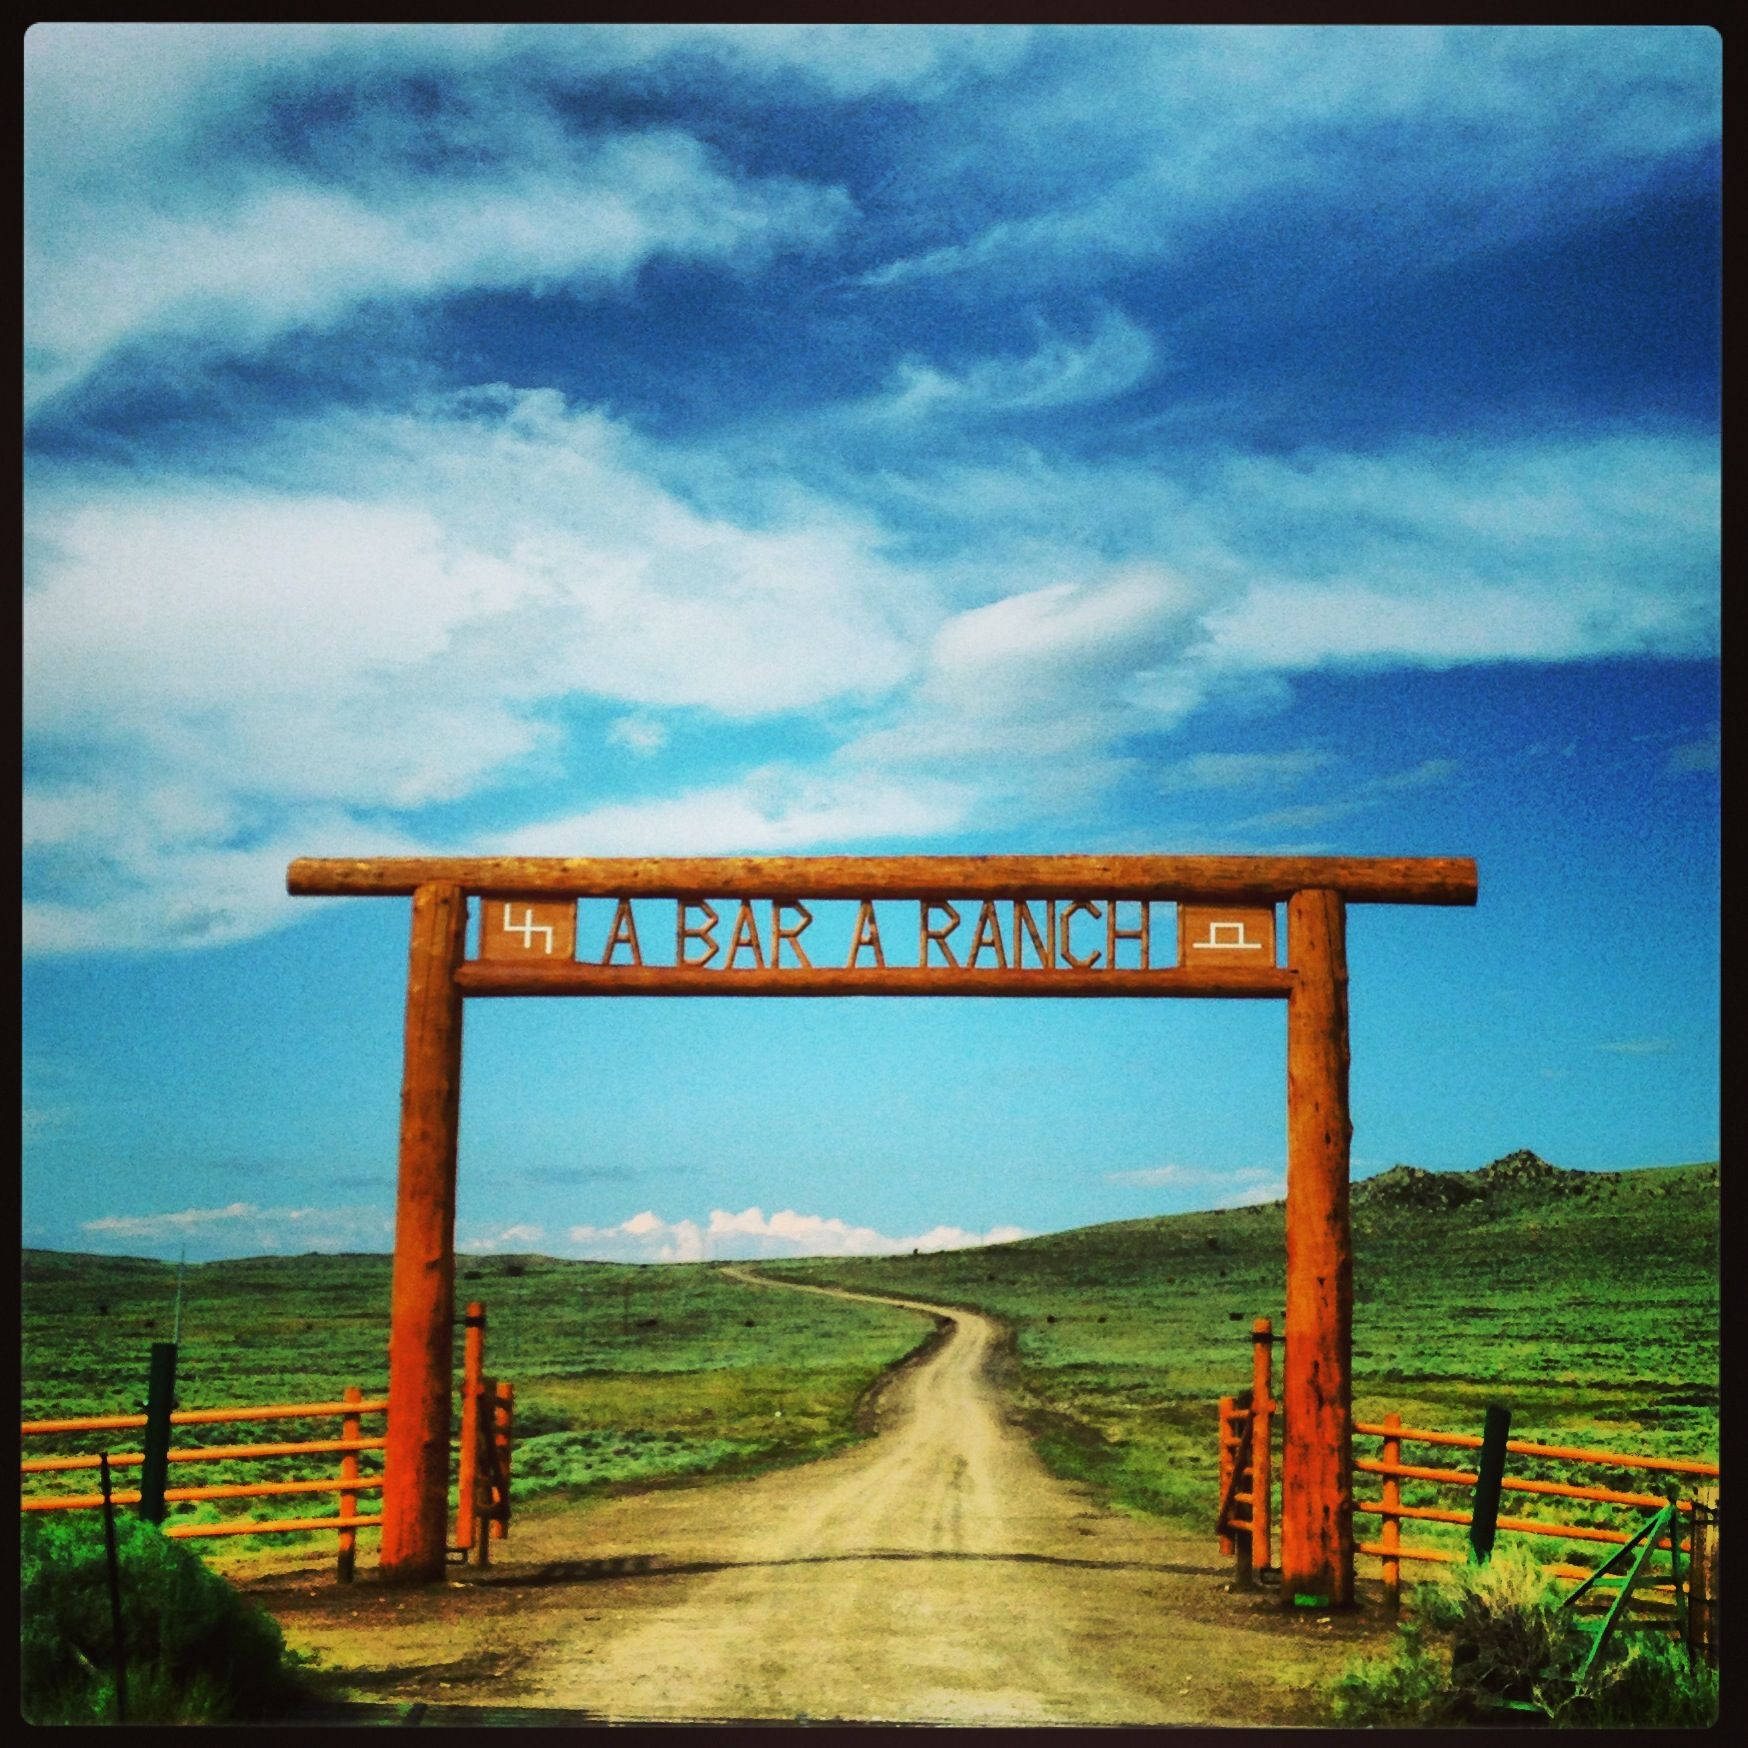 ranch farm jobs in wyoming